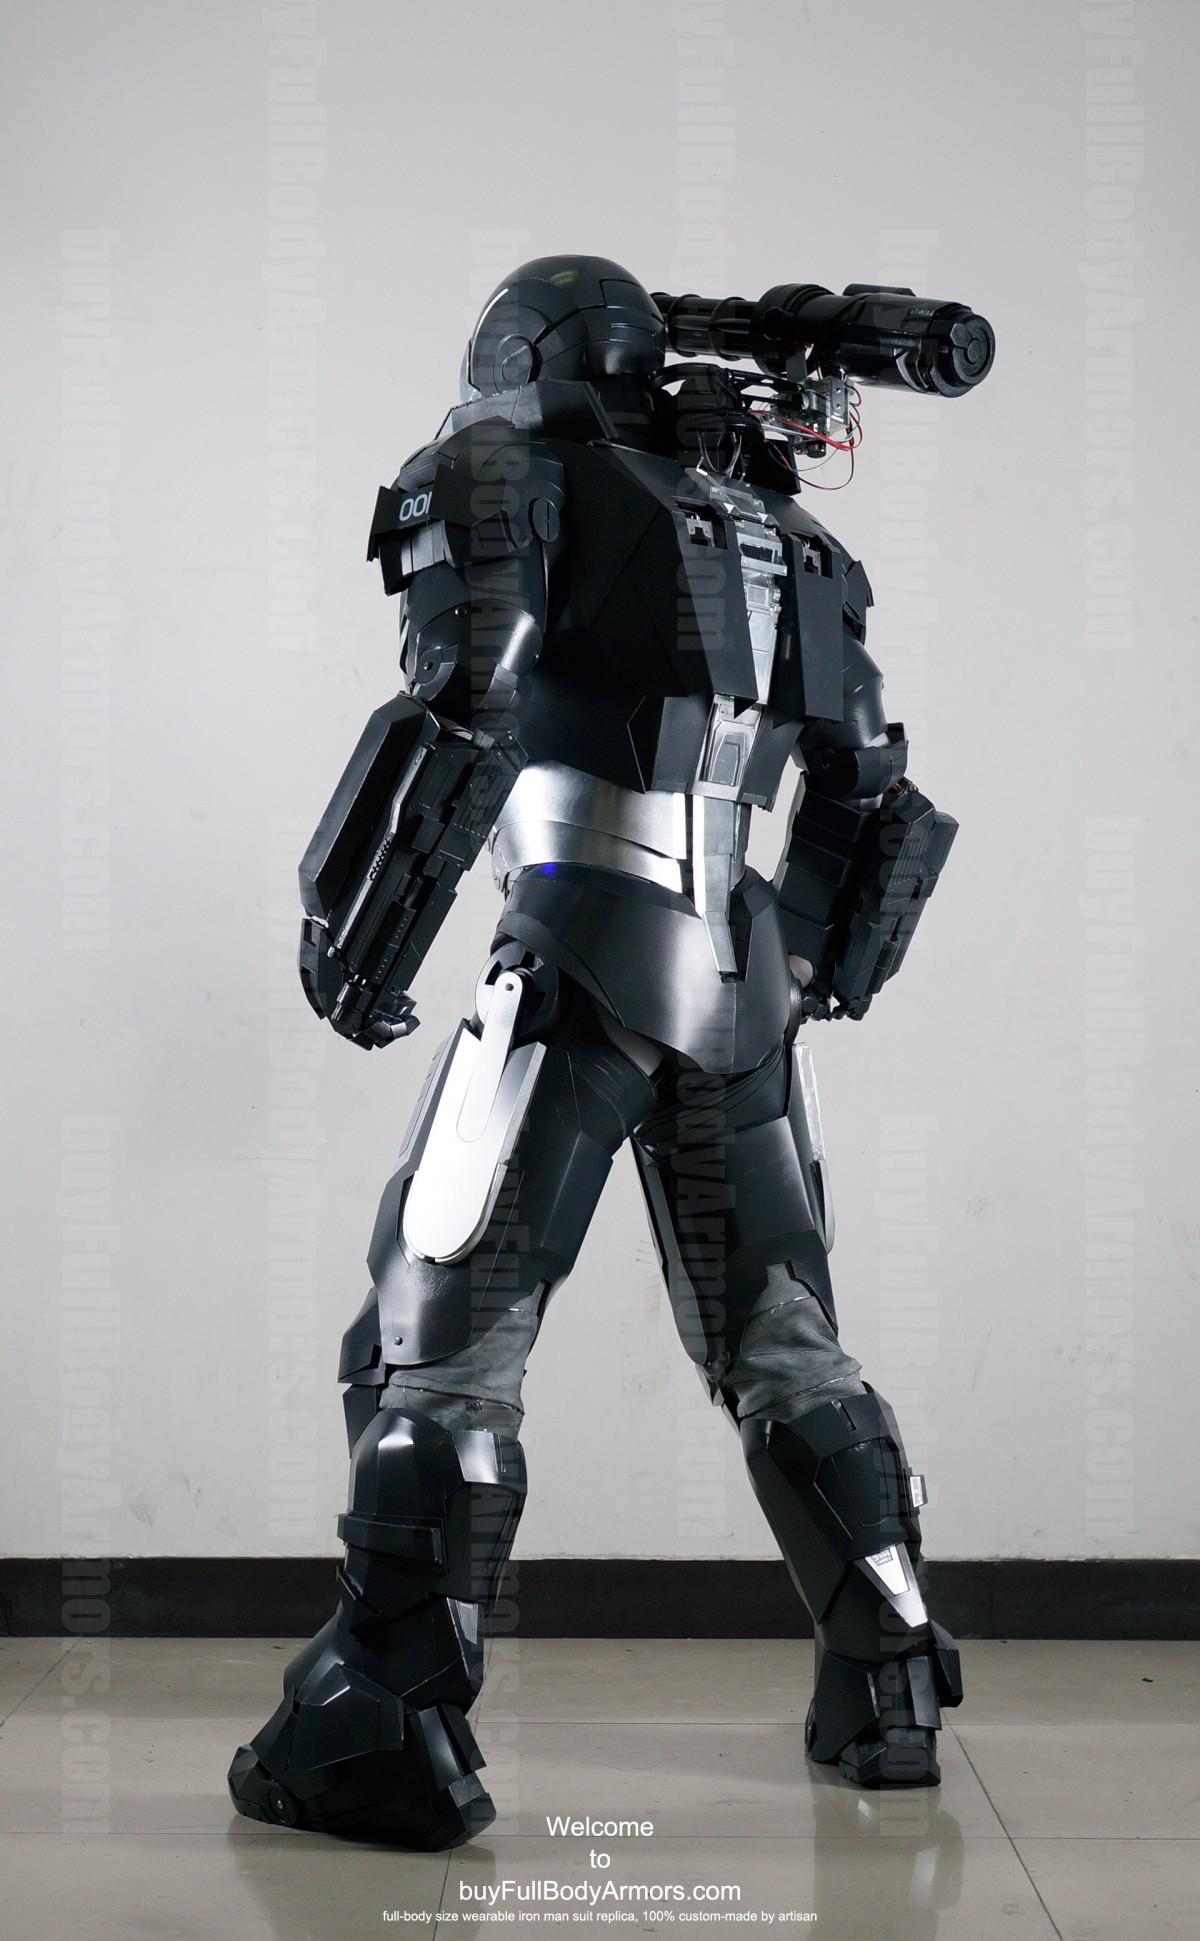 Buy Iron Man suit, Halo Master Chief armor, Batman costume